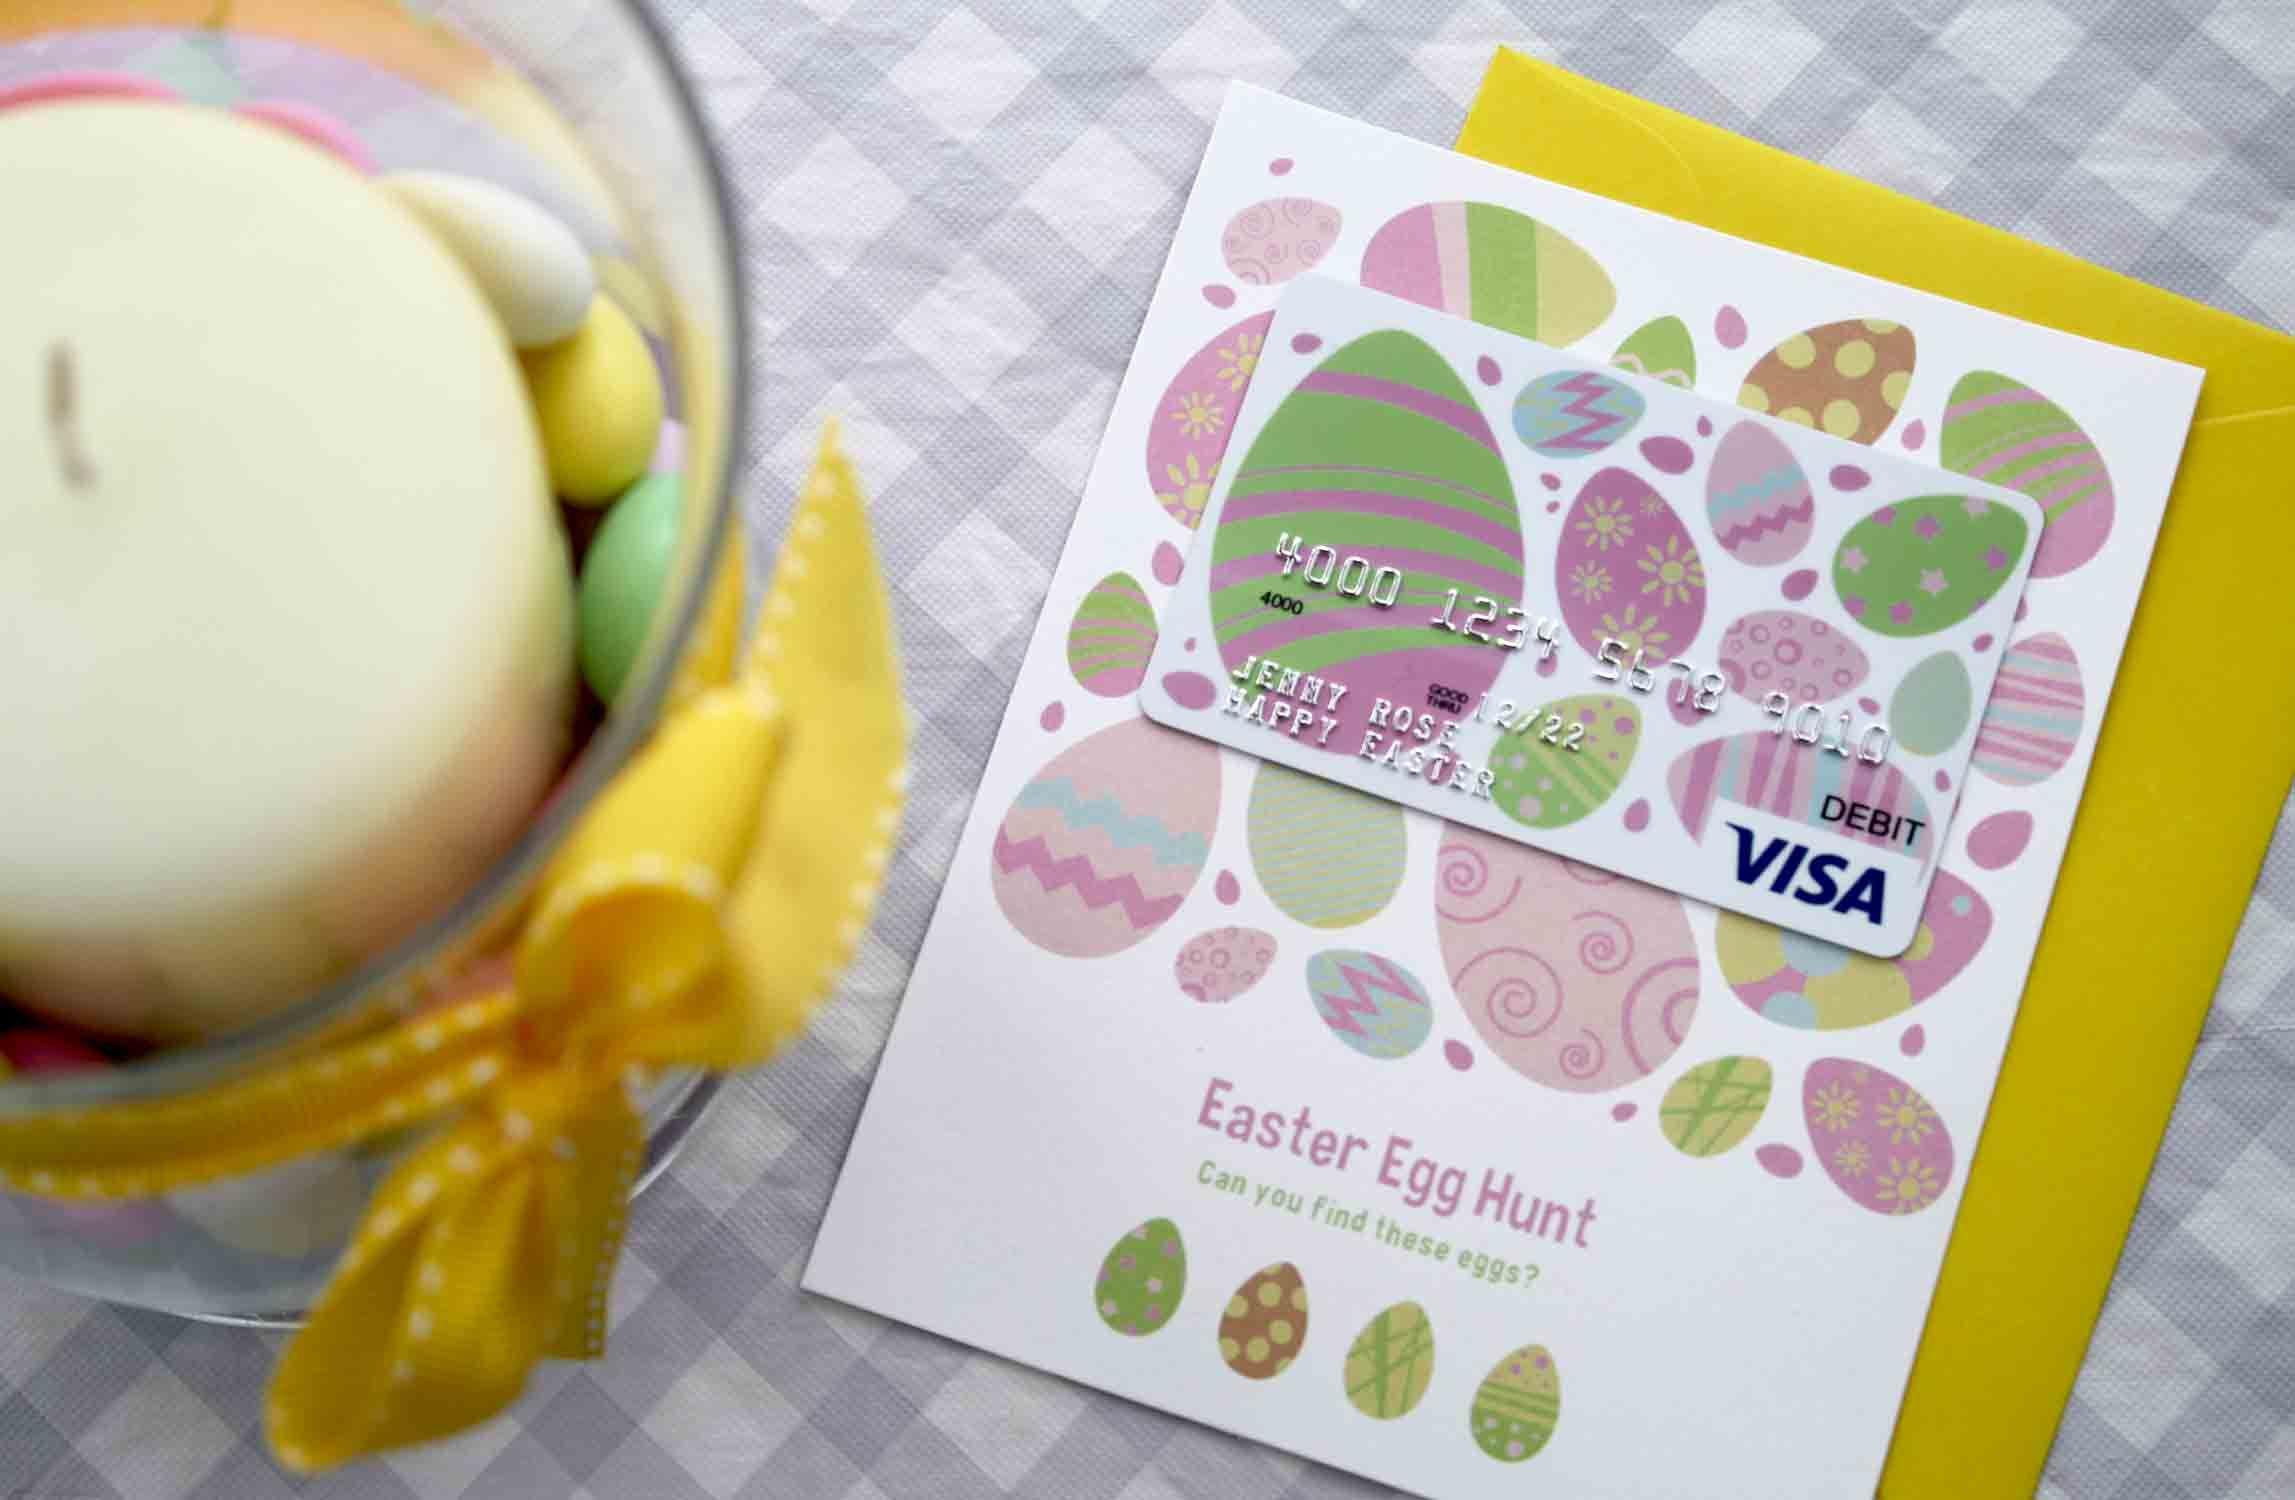 Free printable easter egg hunt gift card holder fun easter games free printable easter egg hunt gift card holder fun easter games and gifts for negle Images